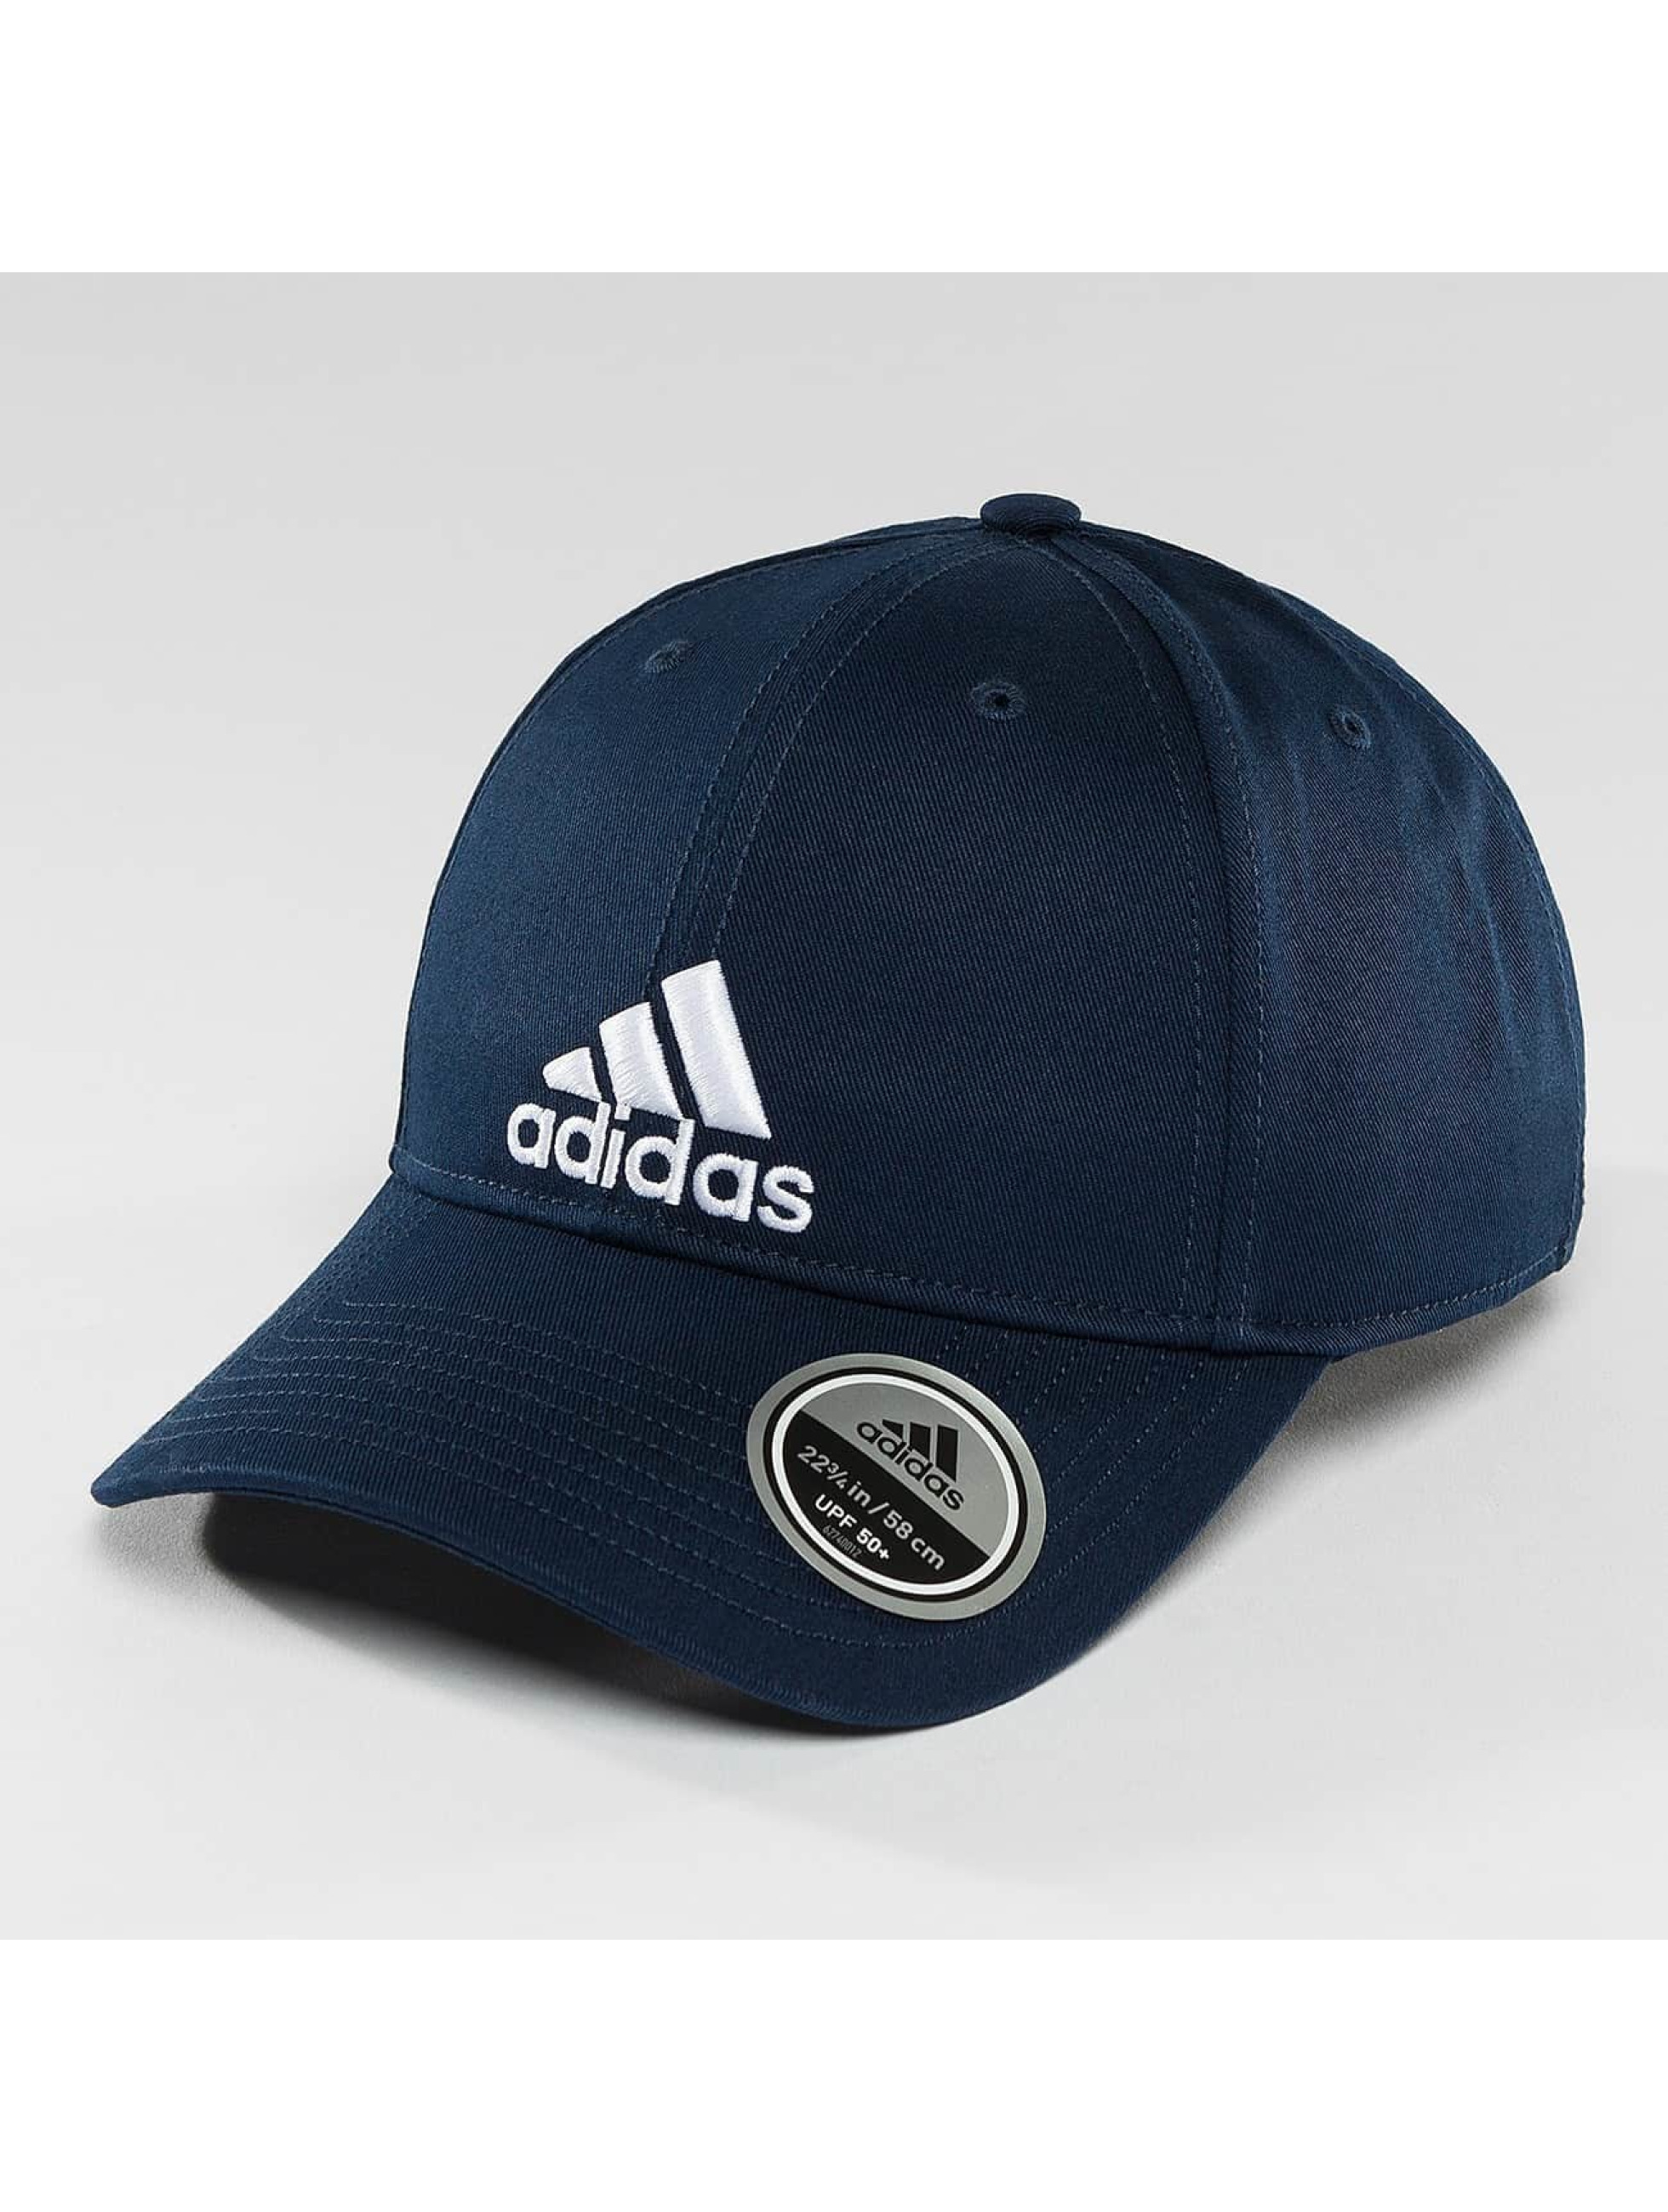 adidas Performance Snapback Cap Snapback Cap blue